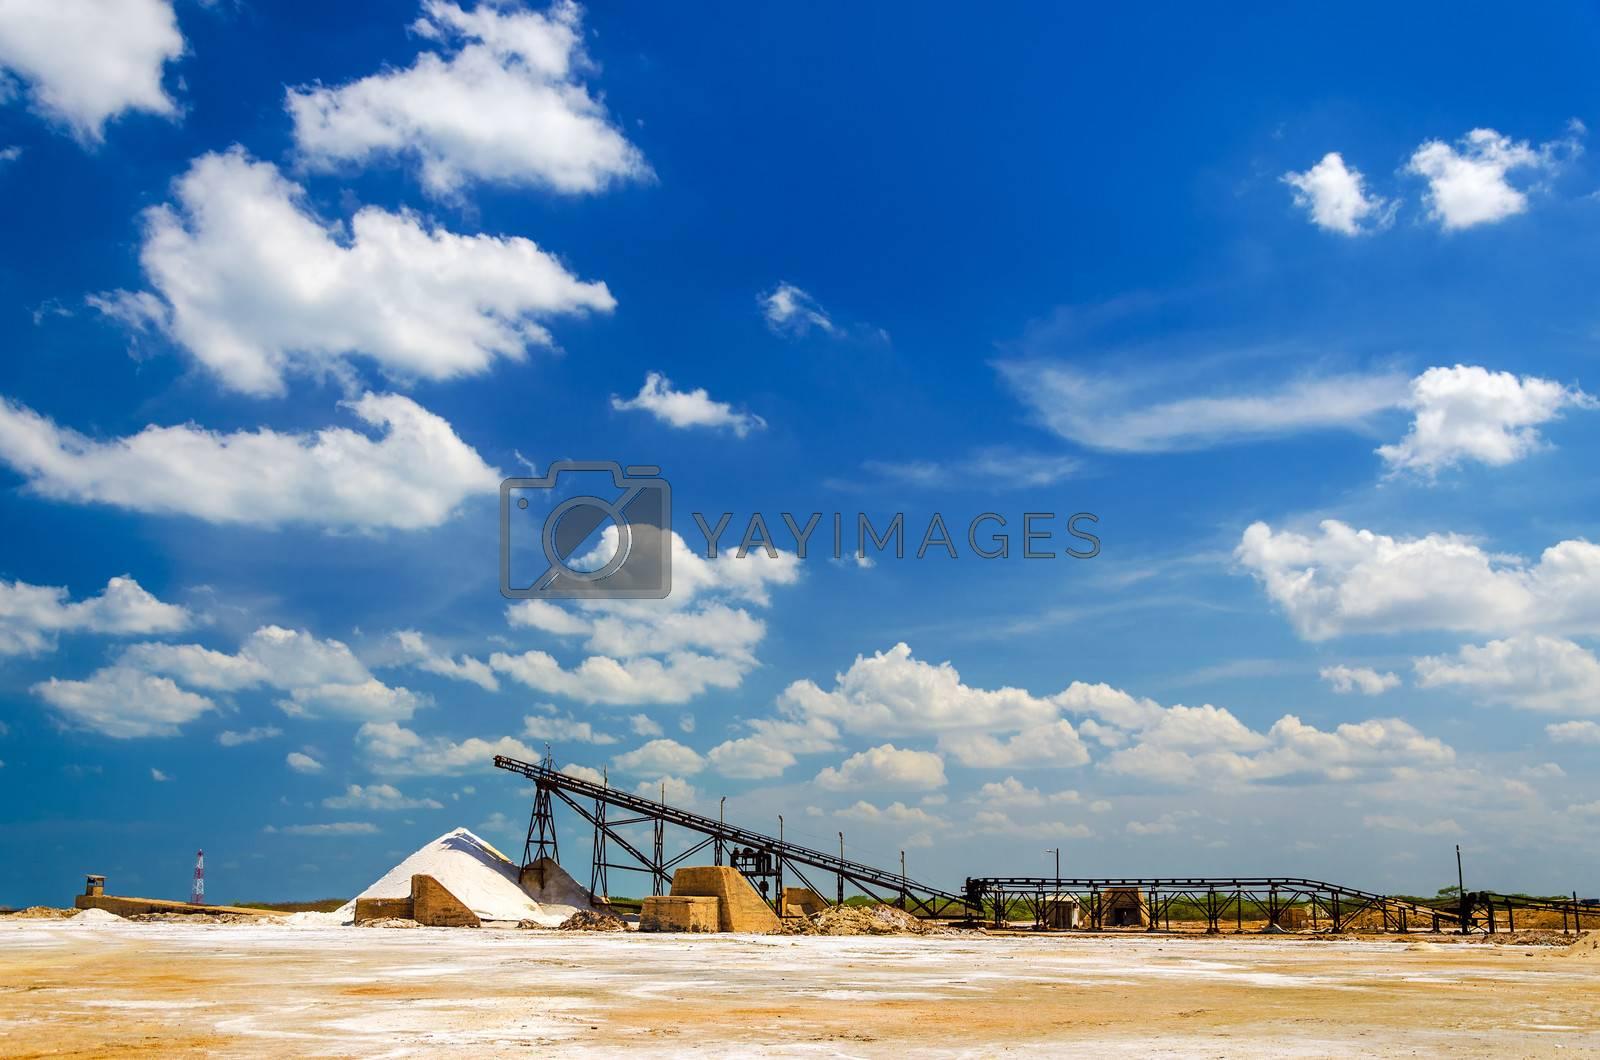 Factory for producing sea salt in Manaure in La Guajira, Colombia